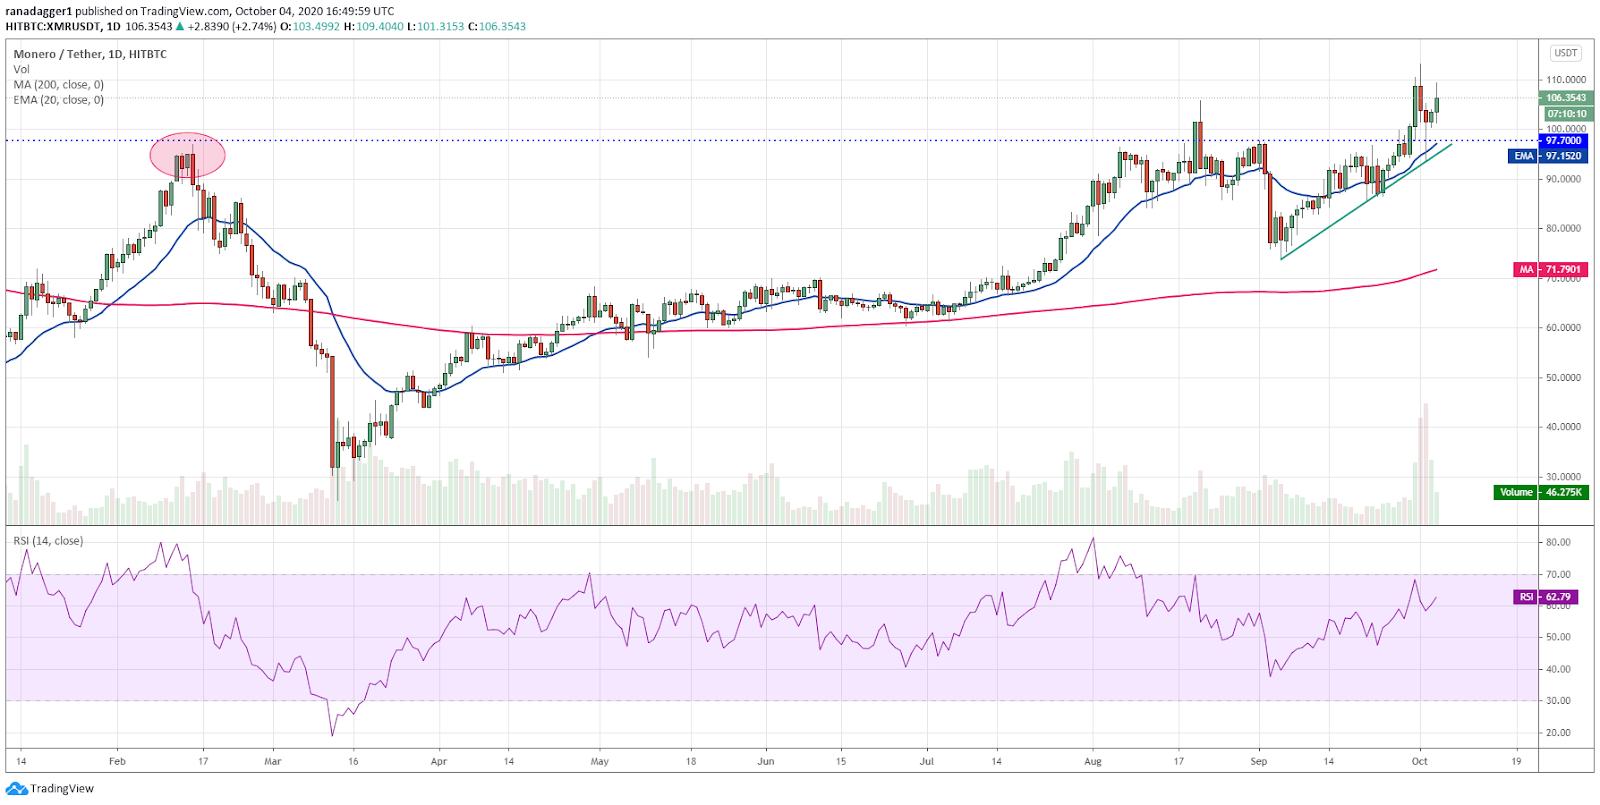 XMR/USD daily chart. Source: TradingView